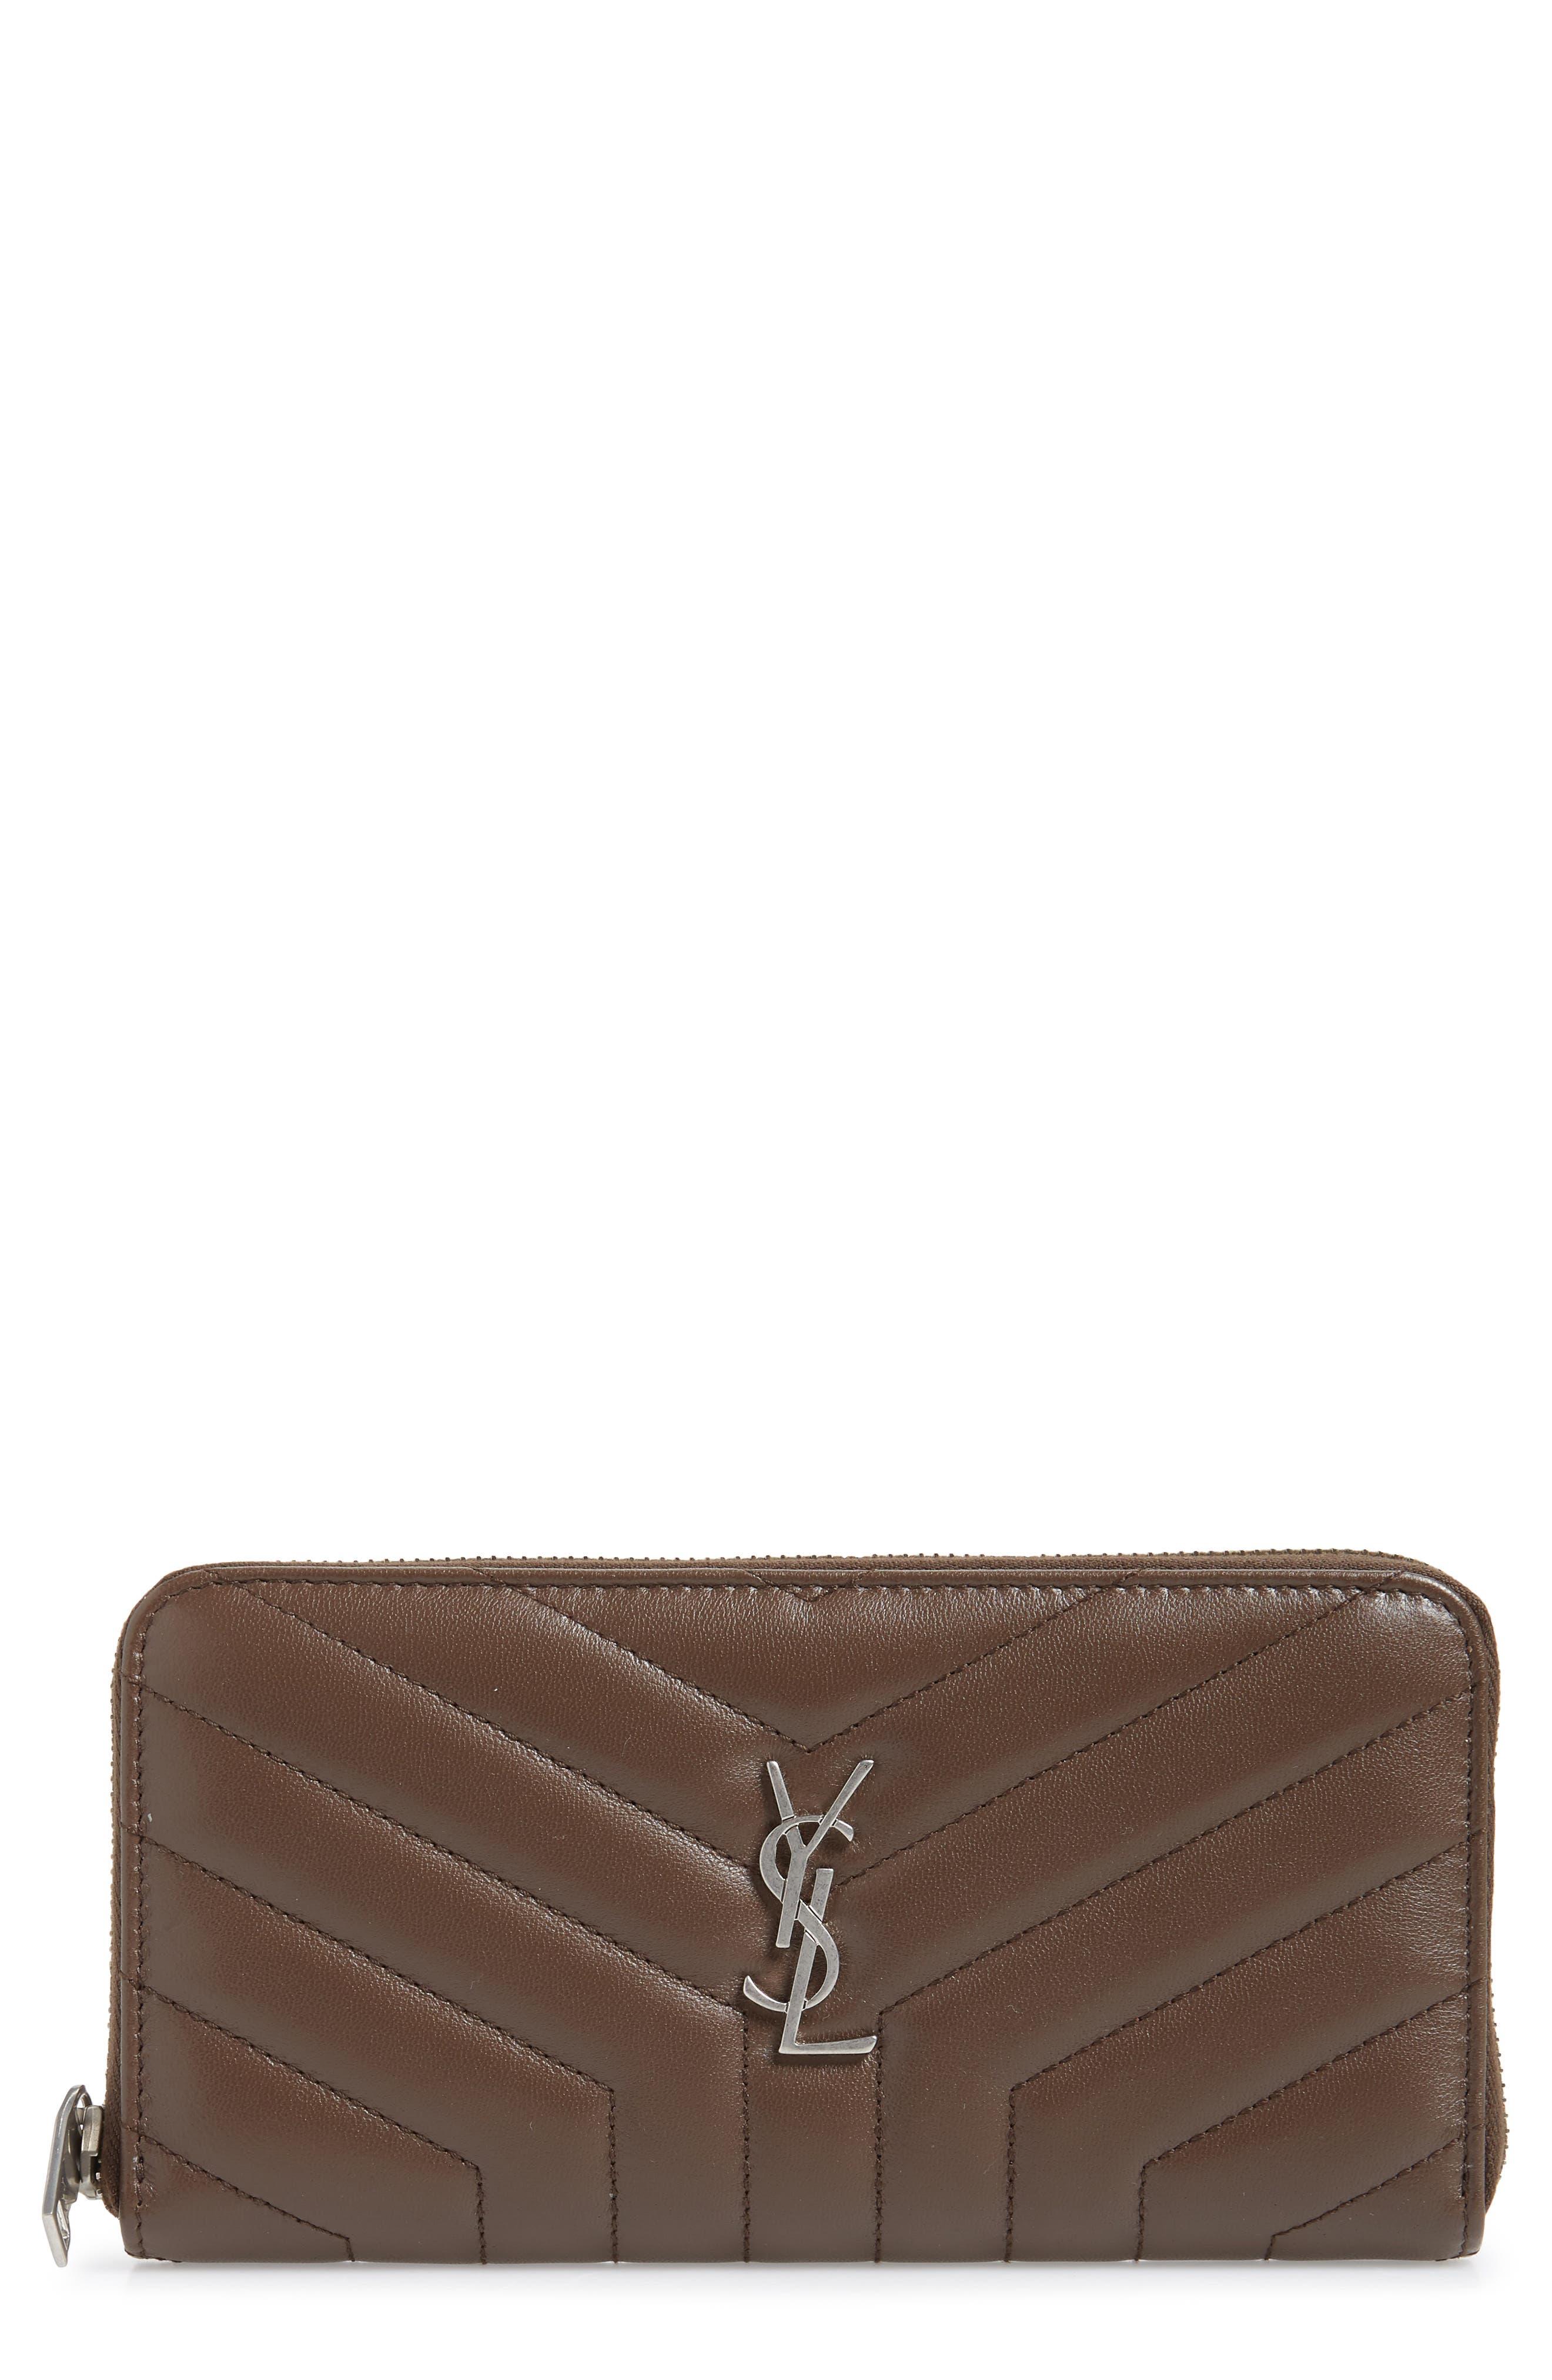 Loulou Matelassé Leather Zip-Around Wallet, Main, color, FAGGIO